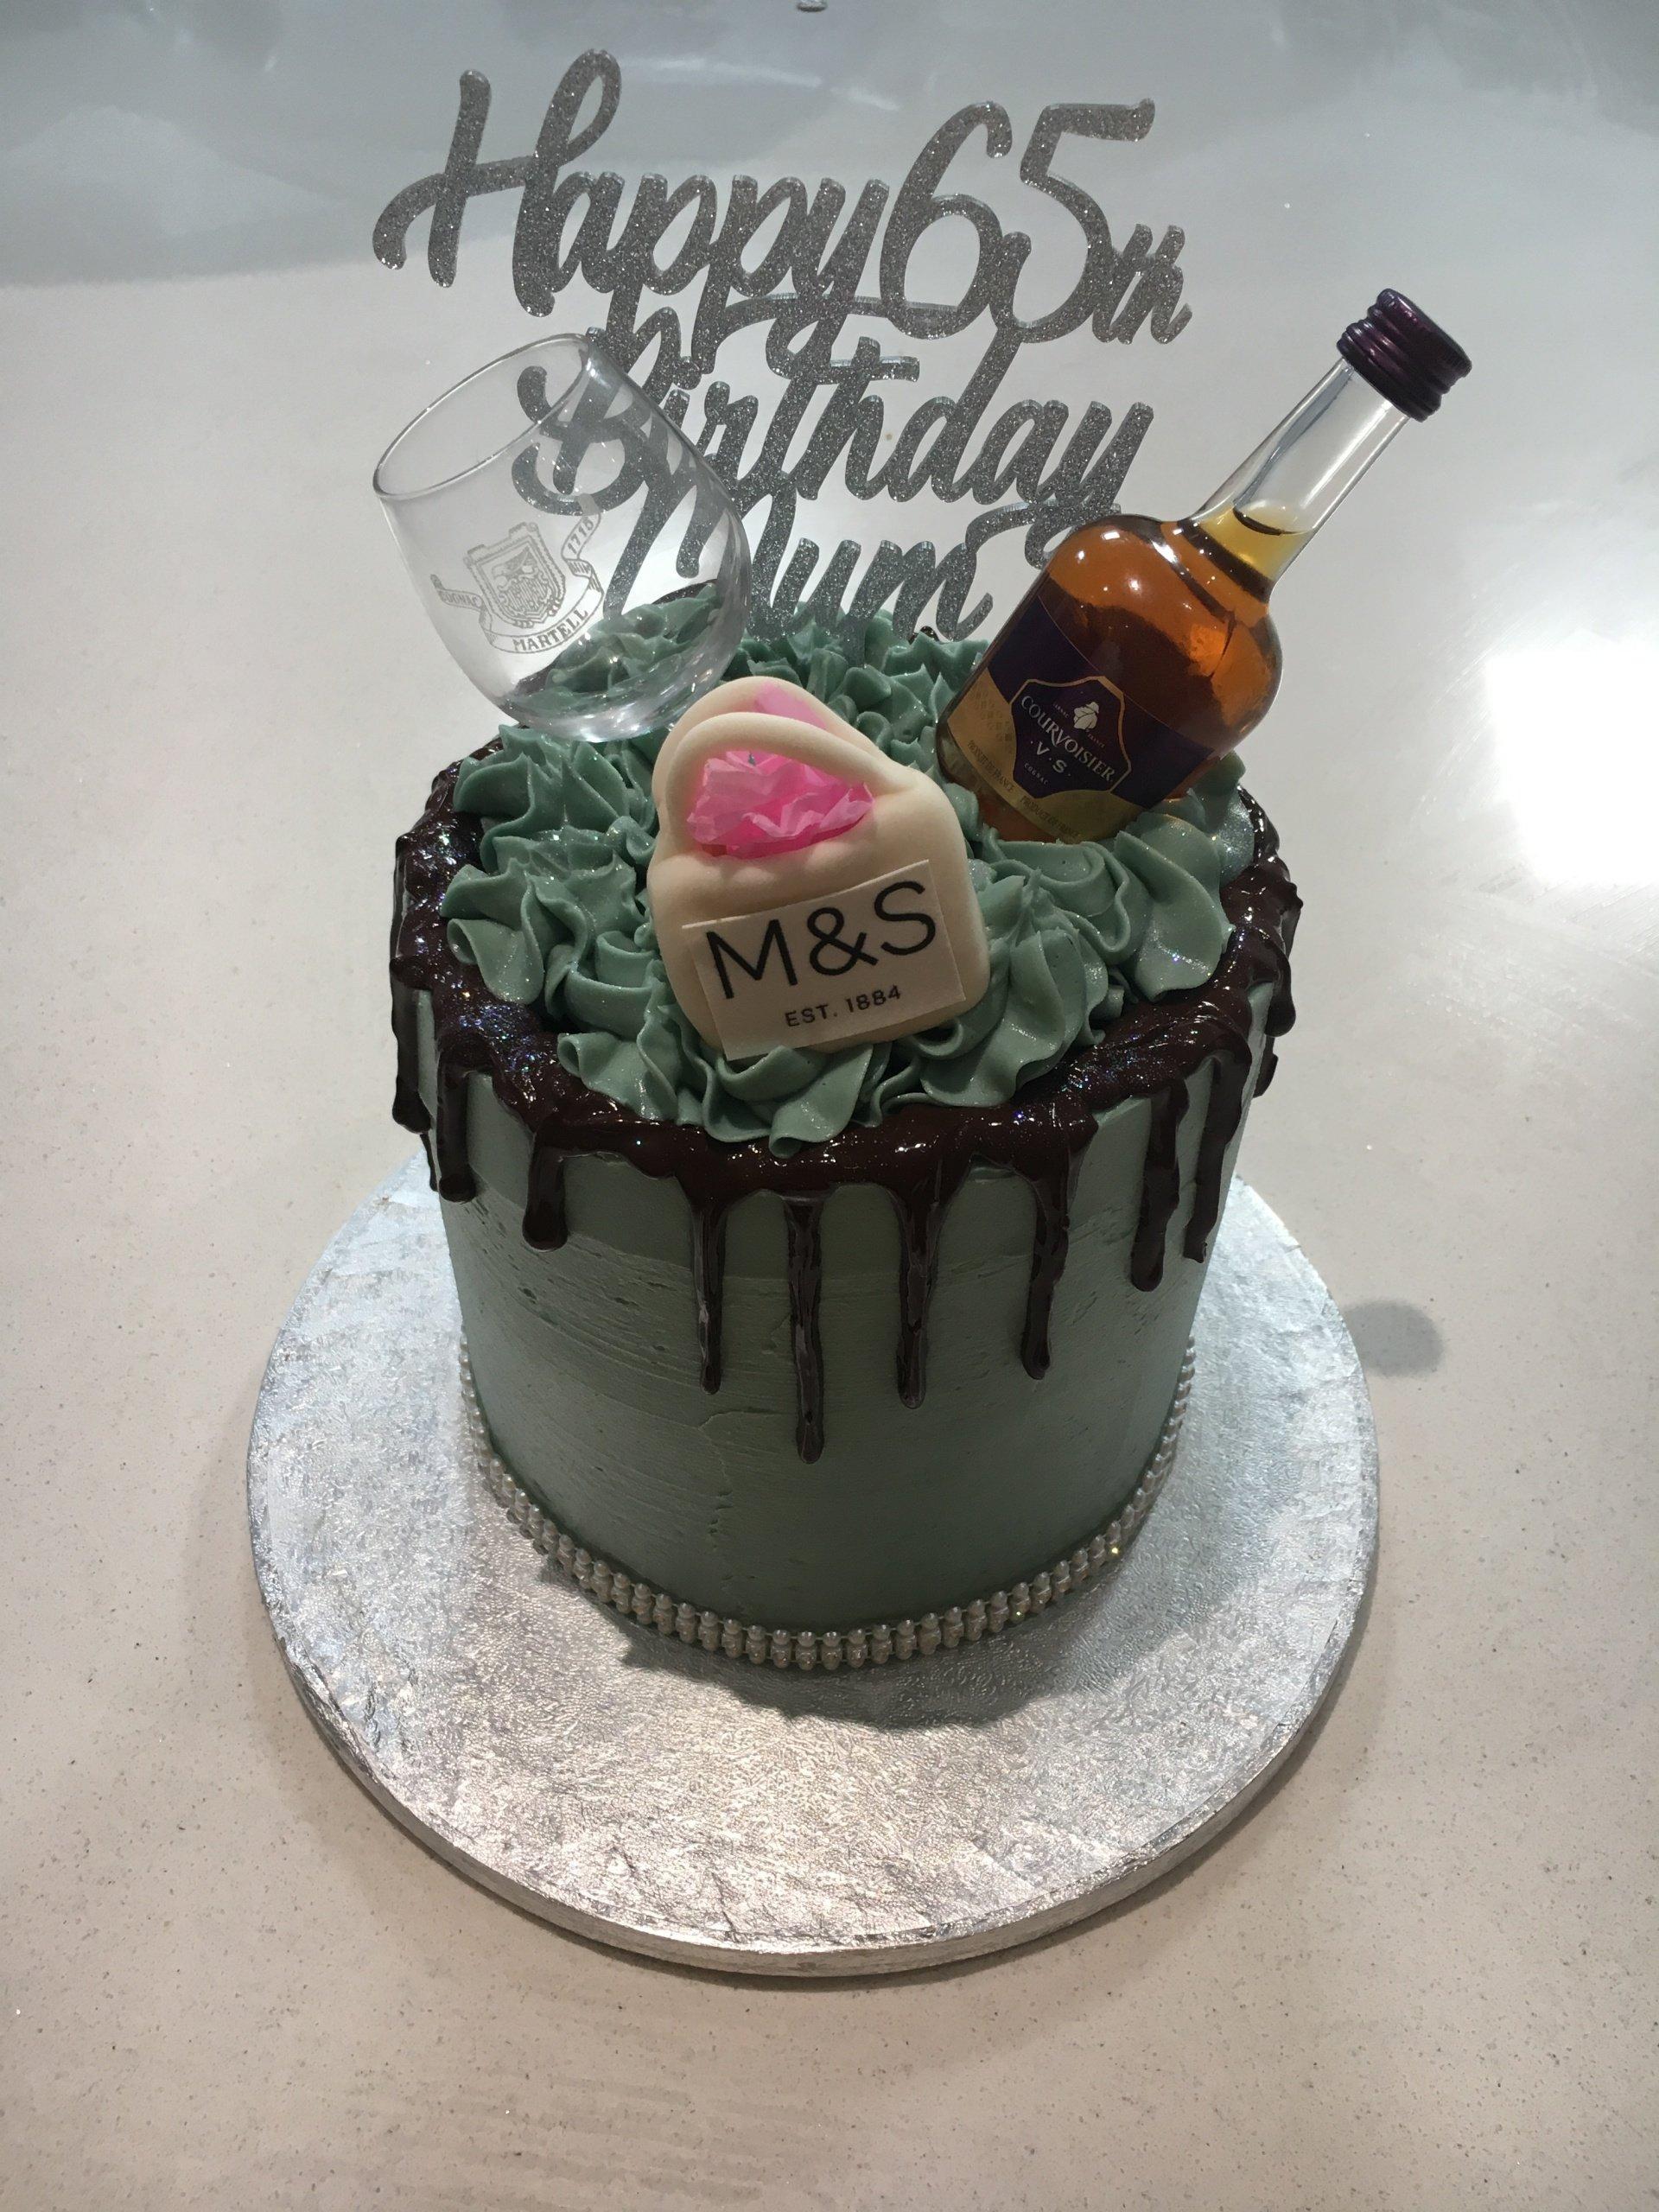 Courvoisier Brandy Cakecourvoisier Brandy Cake